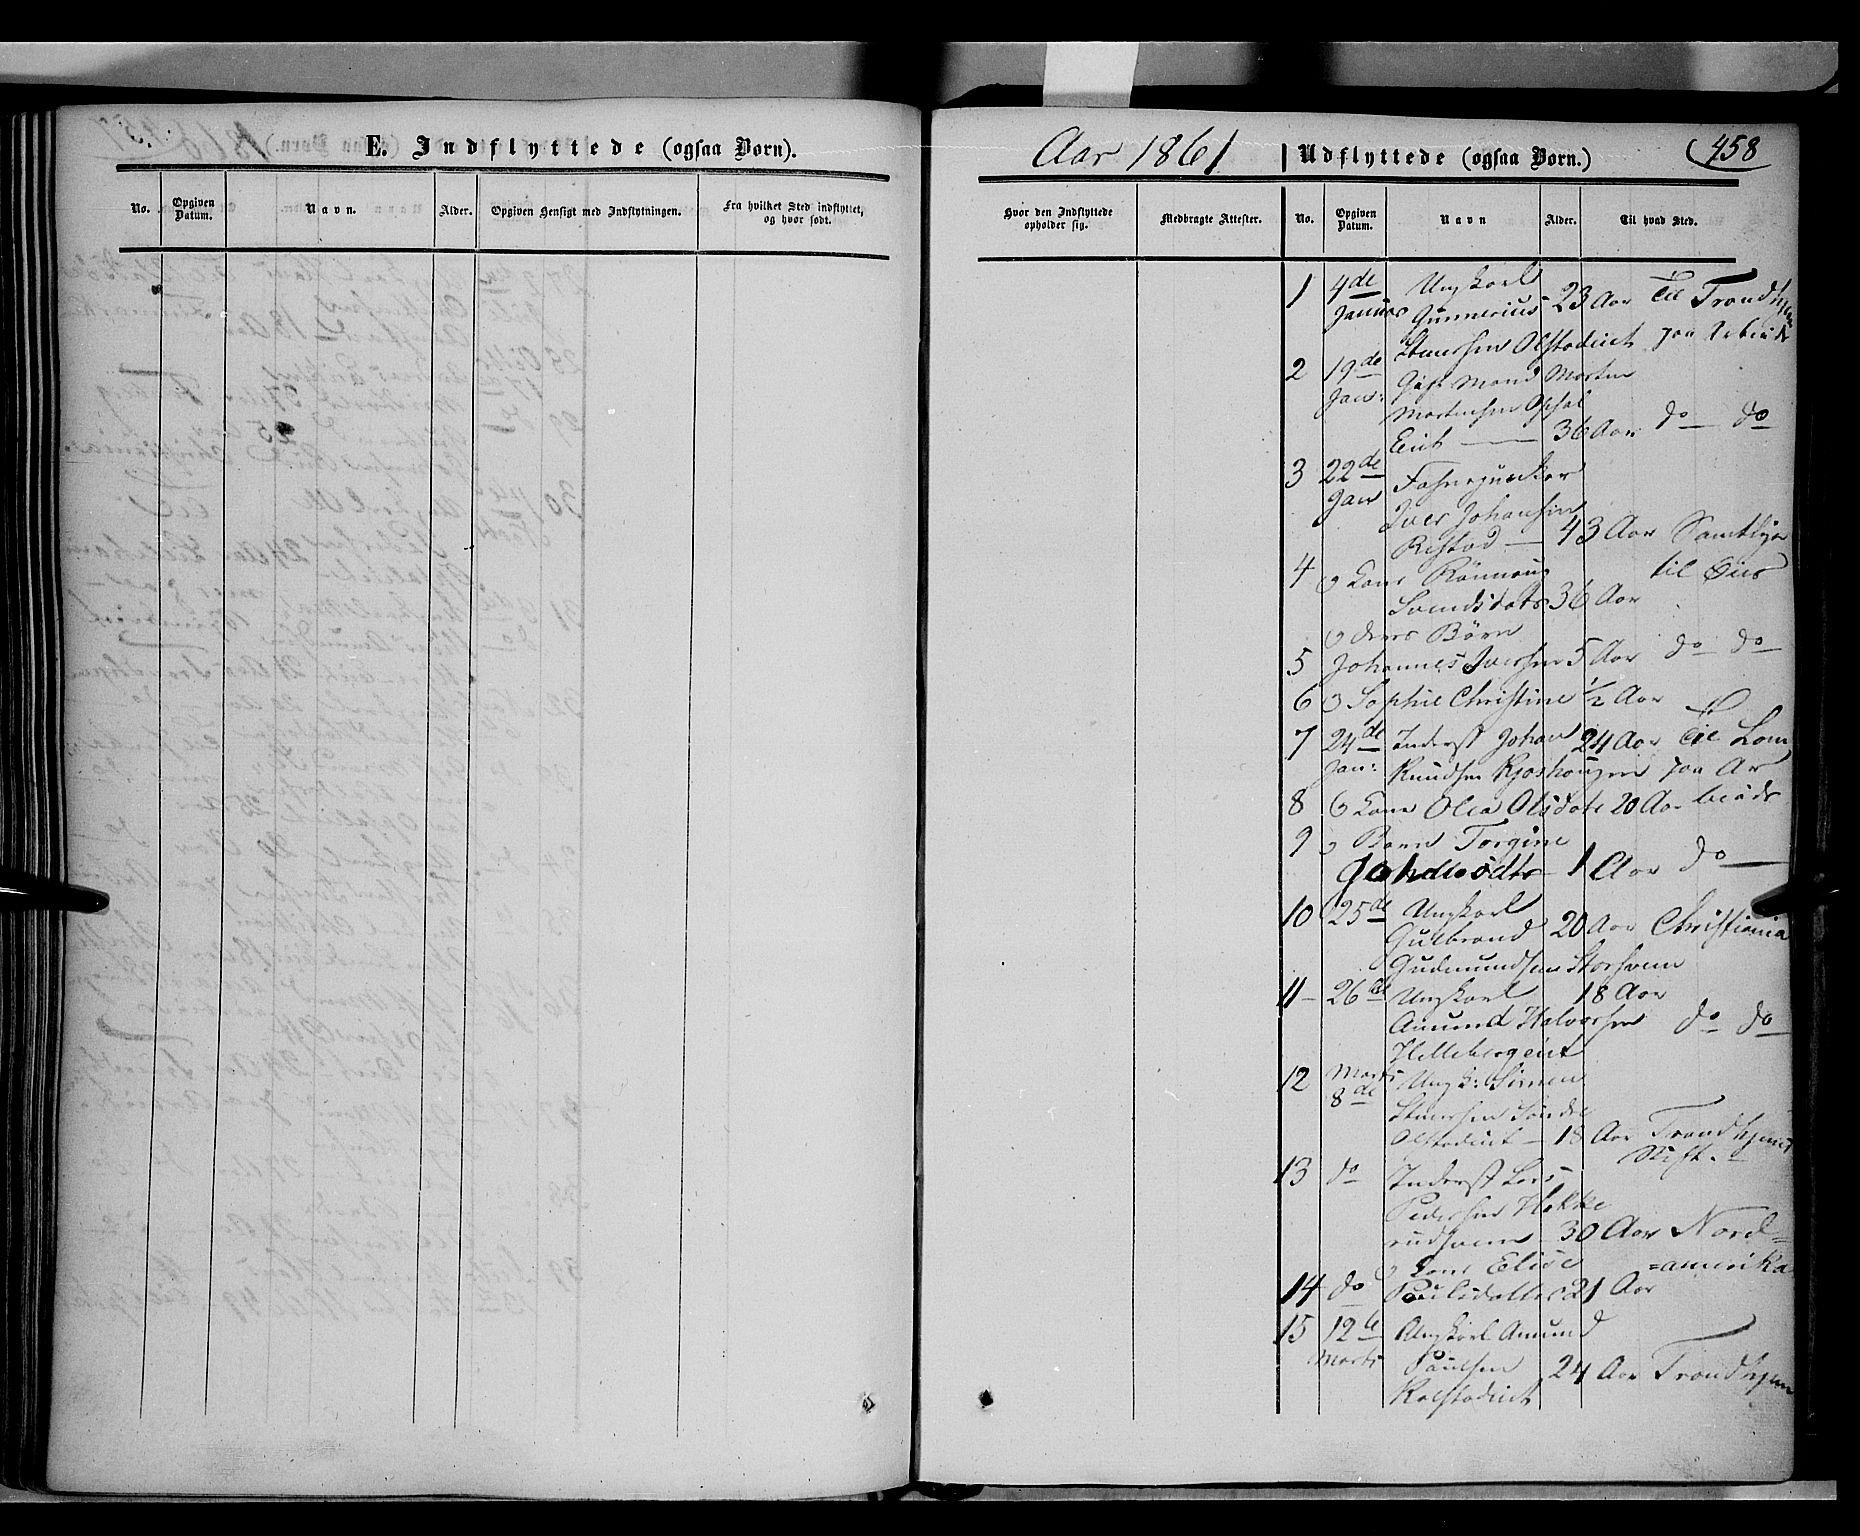 SAH, Gausdal prestekontor, Ministerialbok nr. 8, 1850-1861, s. 458